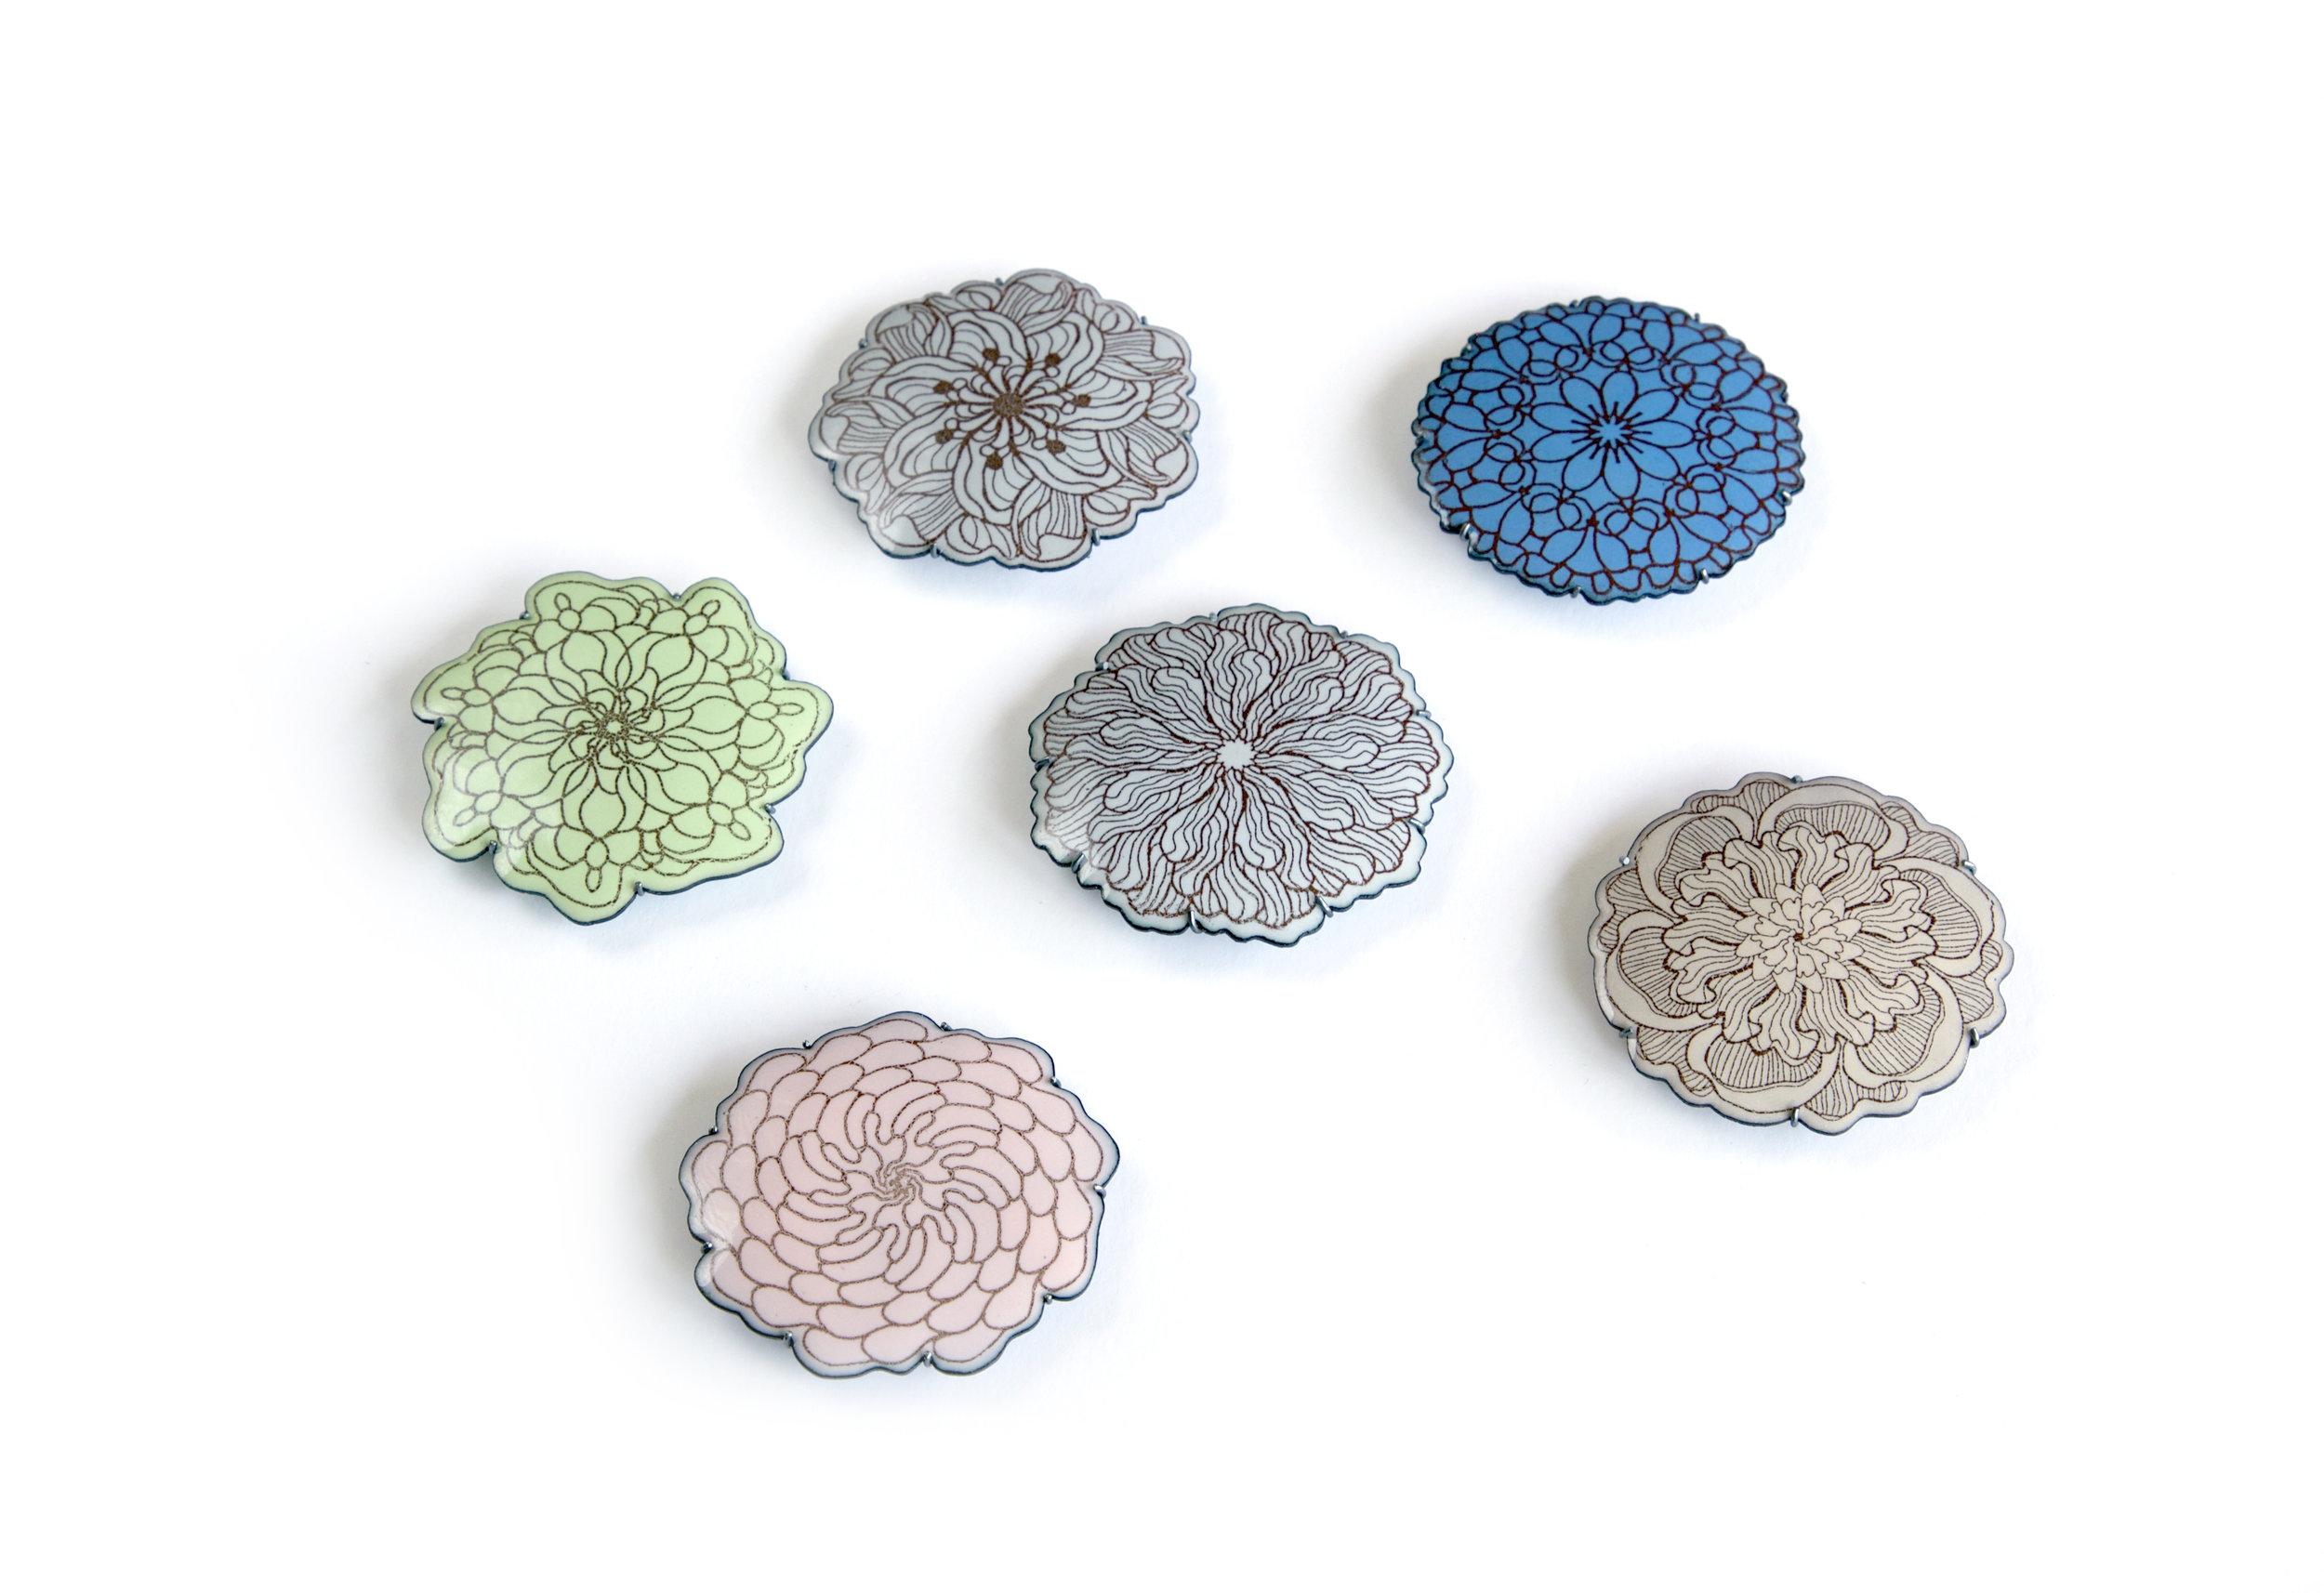 Norwegian Enamel Repossesed. 2016  Series of enamel brooches. Enamel, copper and silver.